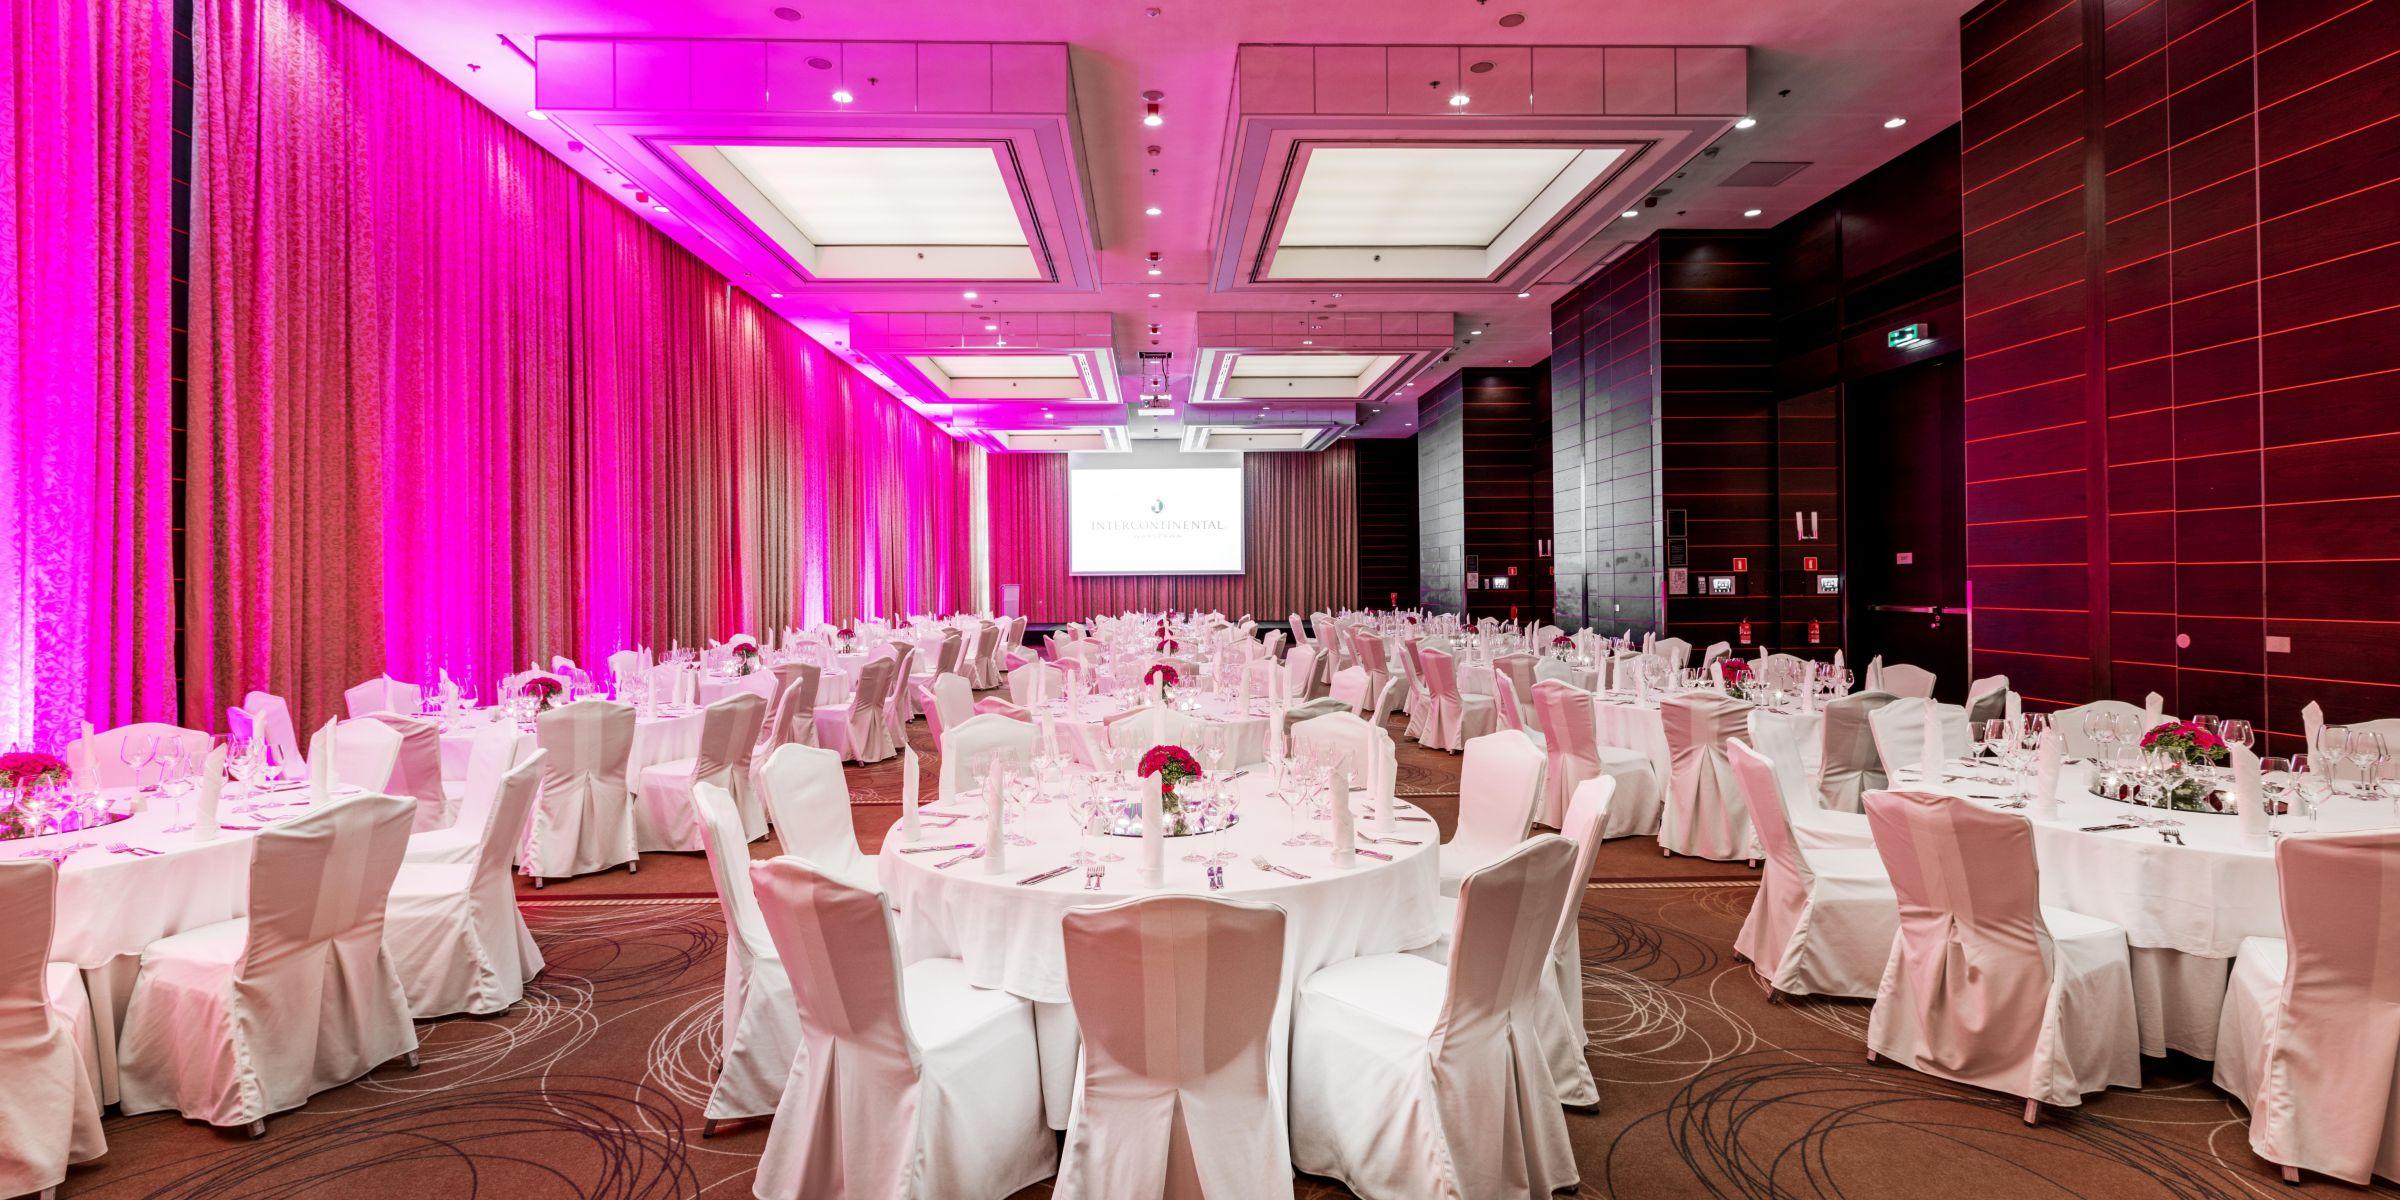 InterContinental Warsaw - Hotel Meeting Rooms & Wedding Rentals